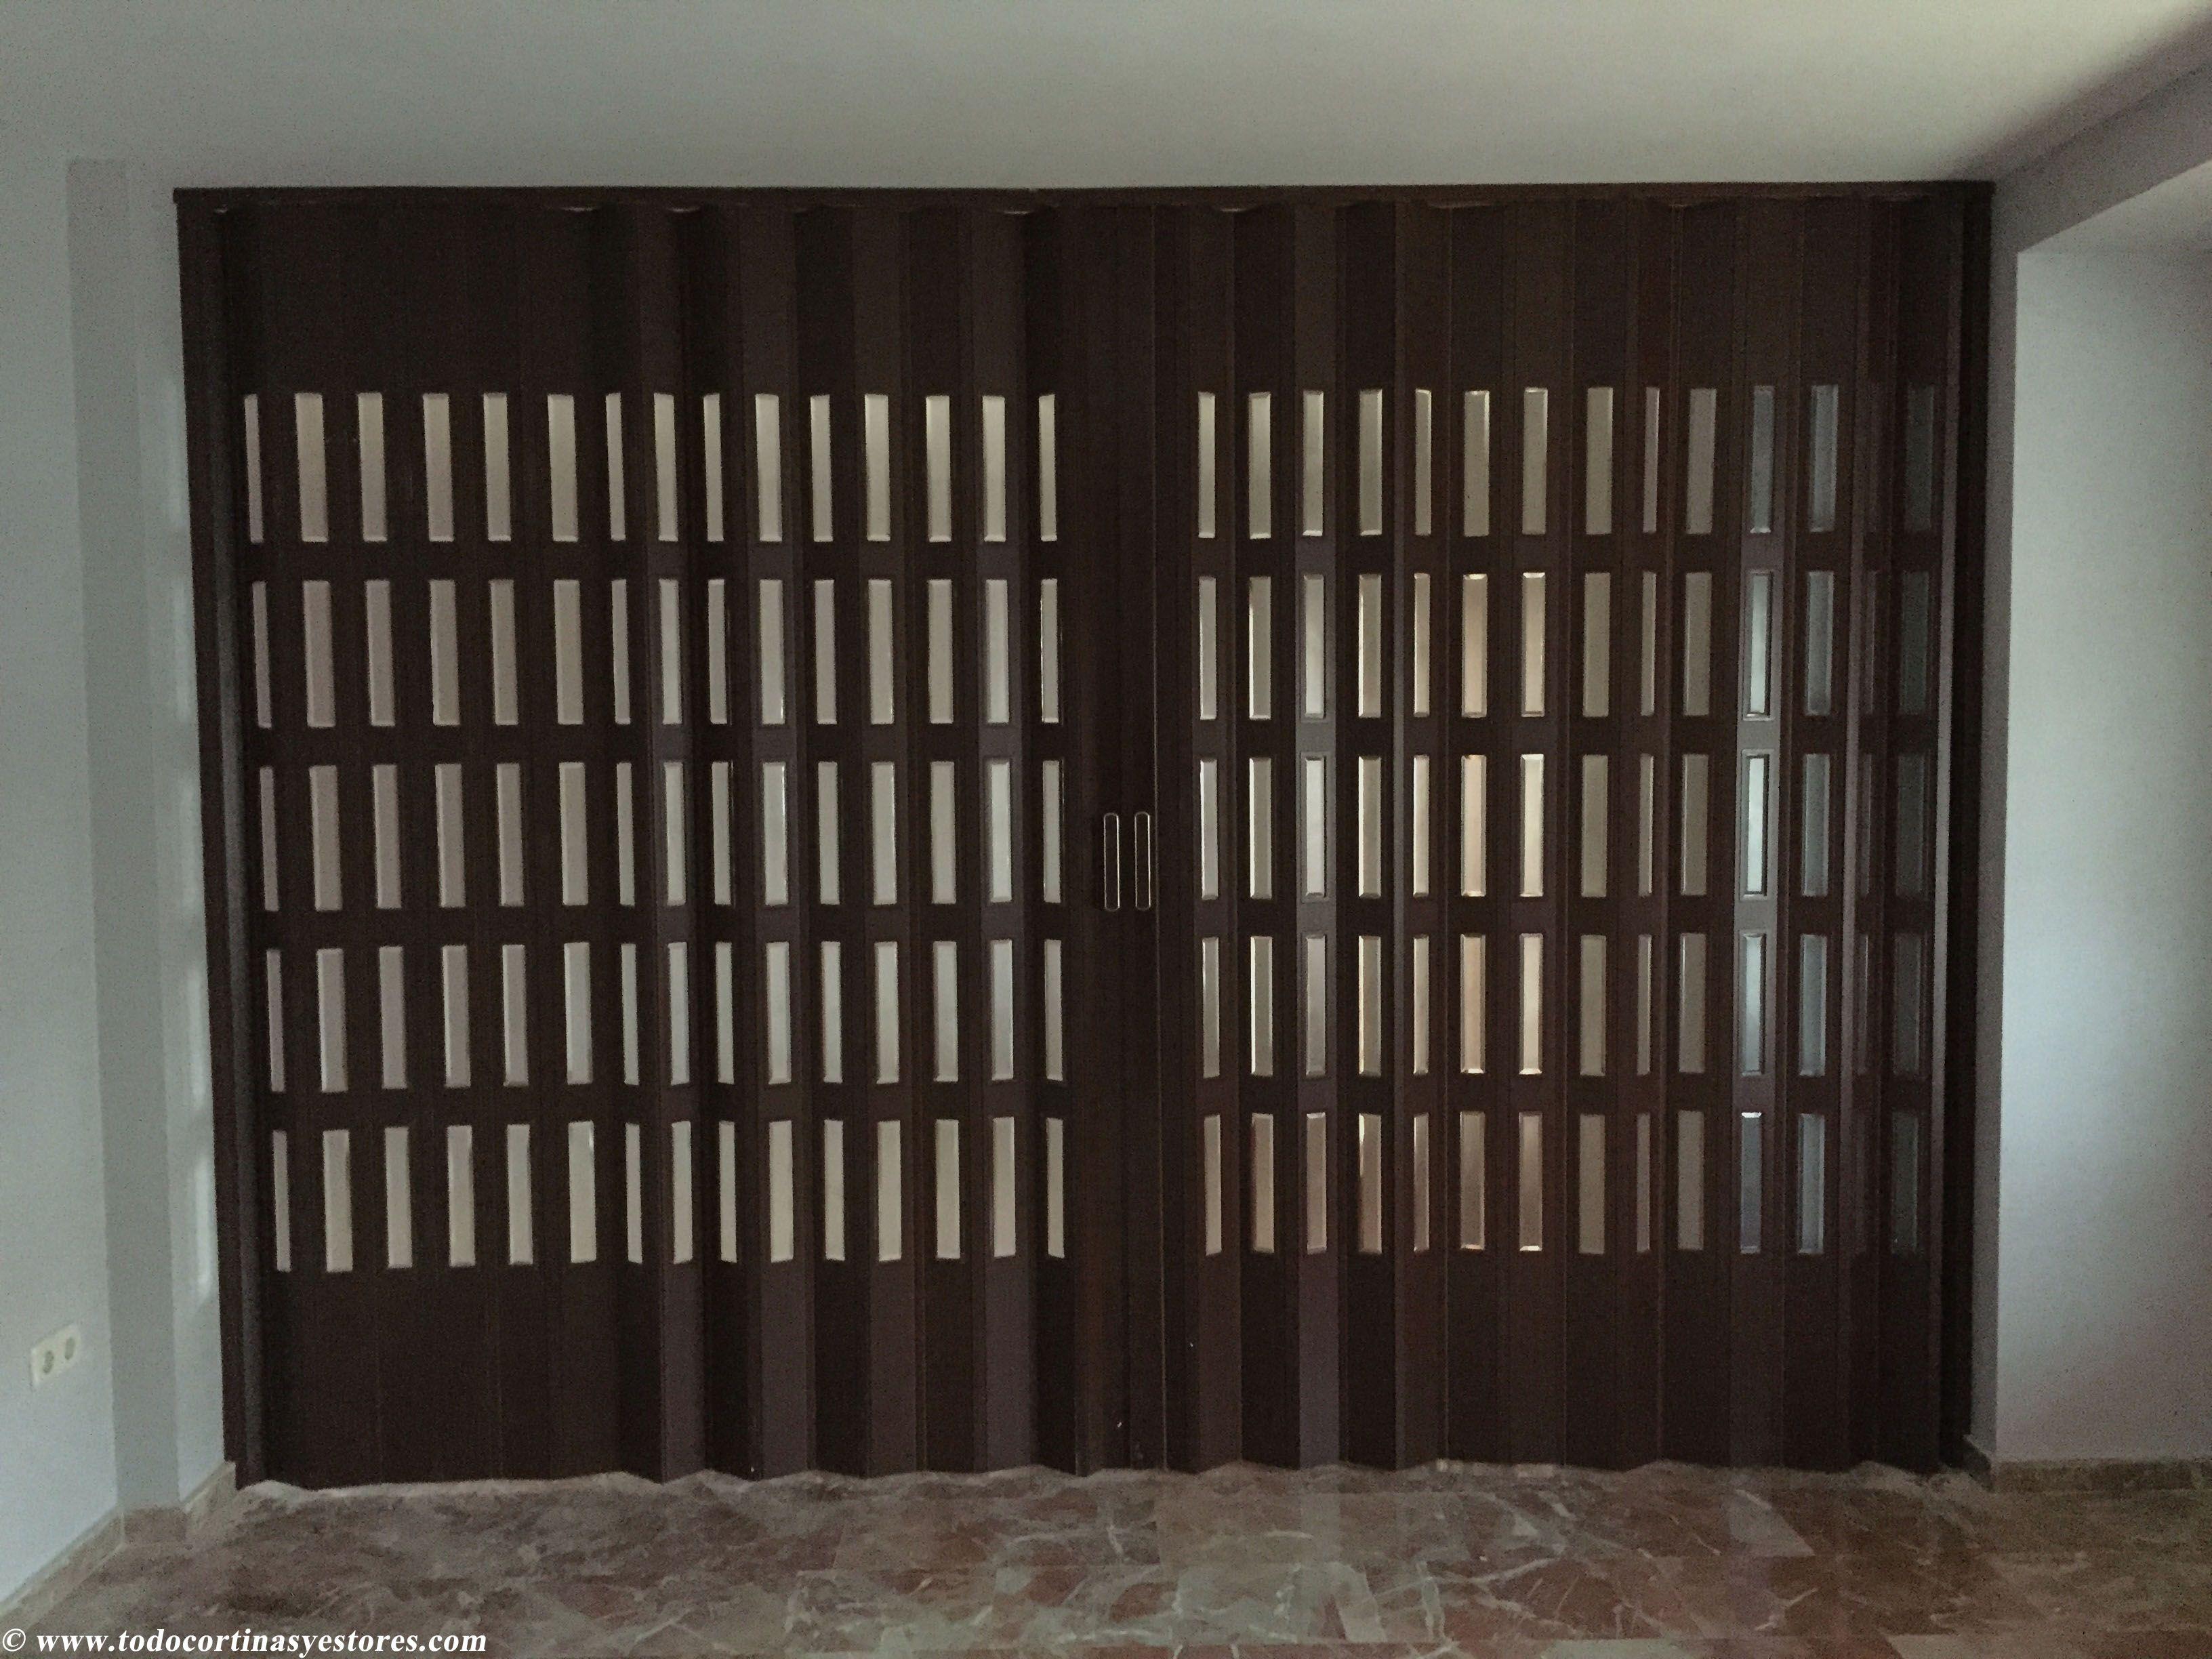 Puertas plegables barcelona perfect cristaleria en - Puertas madera barcelona ...